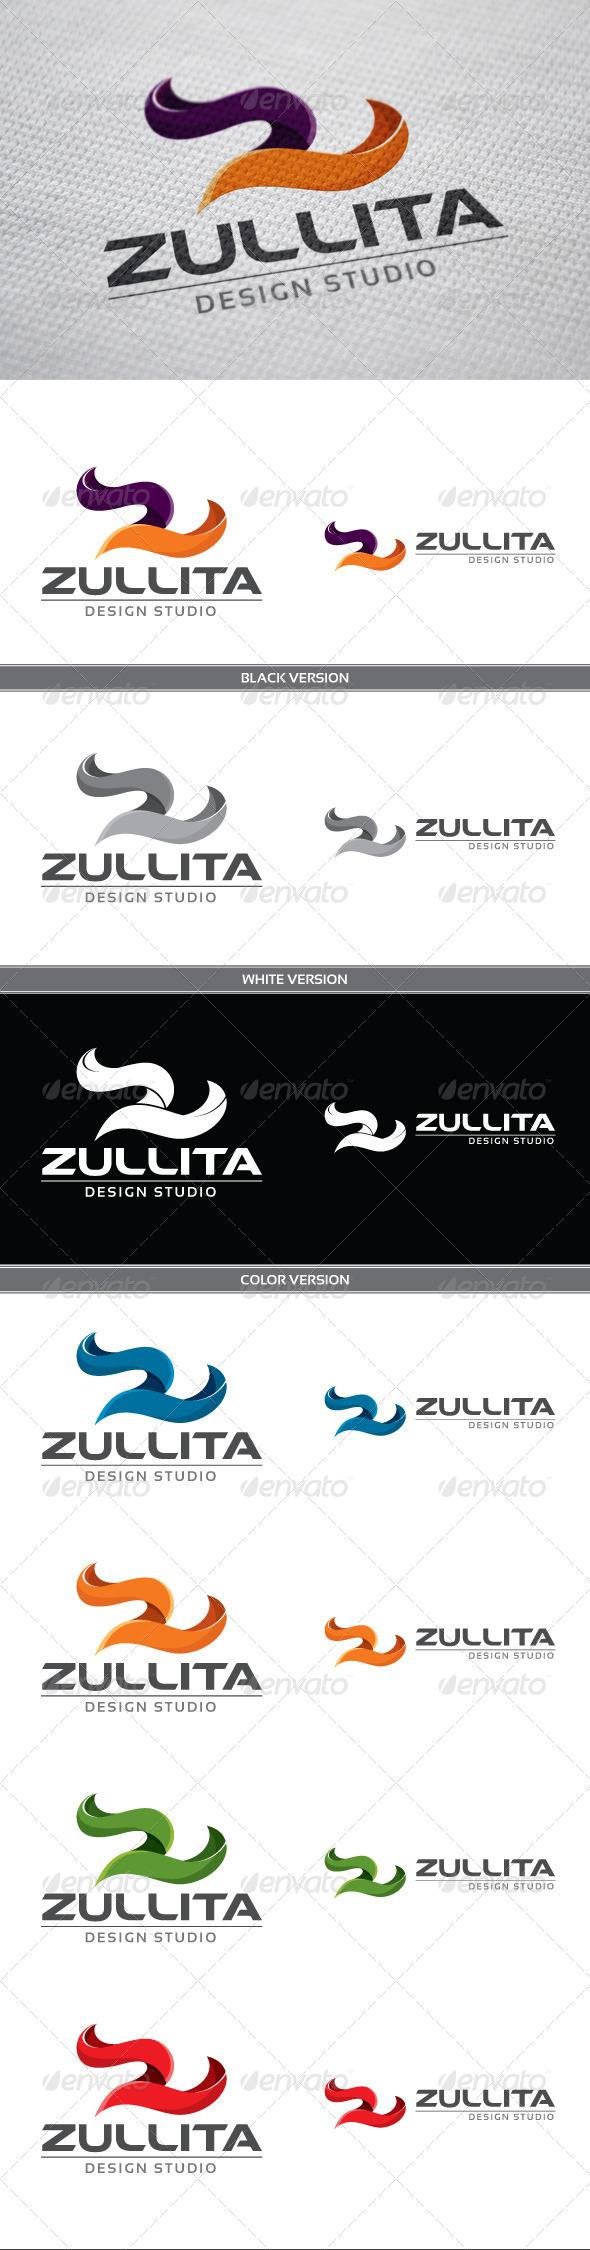 GraphicRiver Zullita 4173200